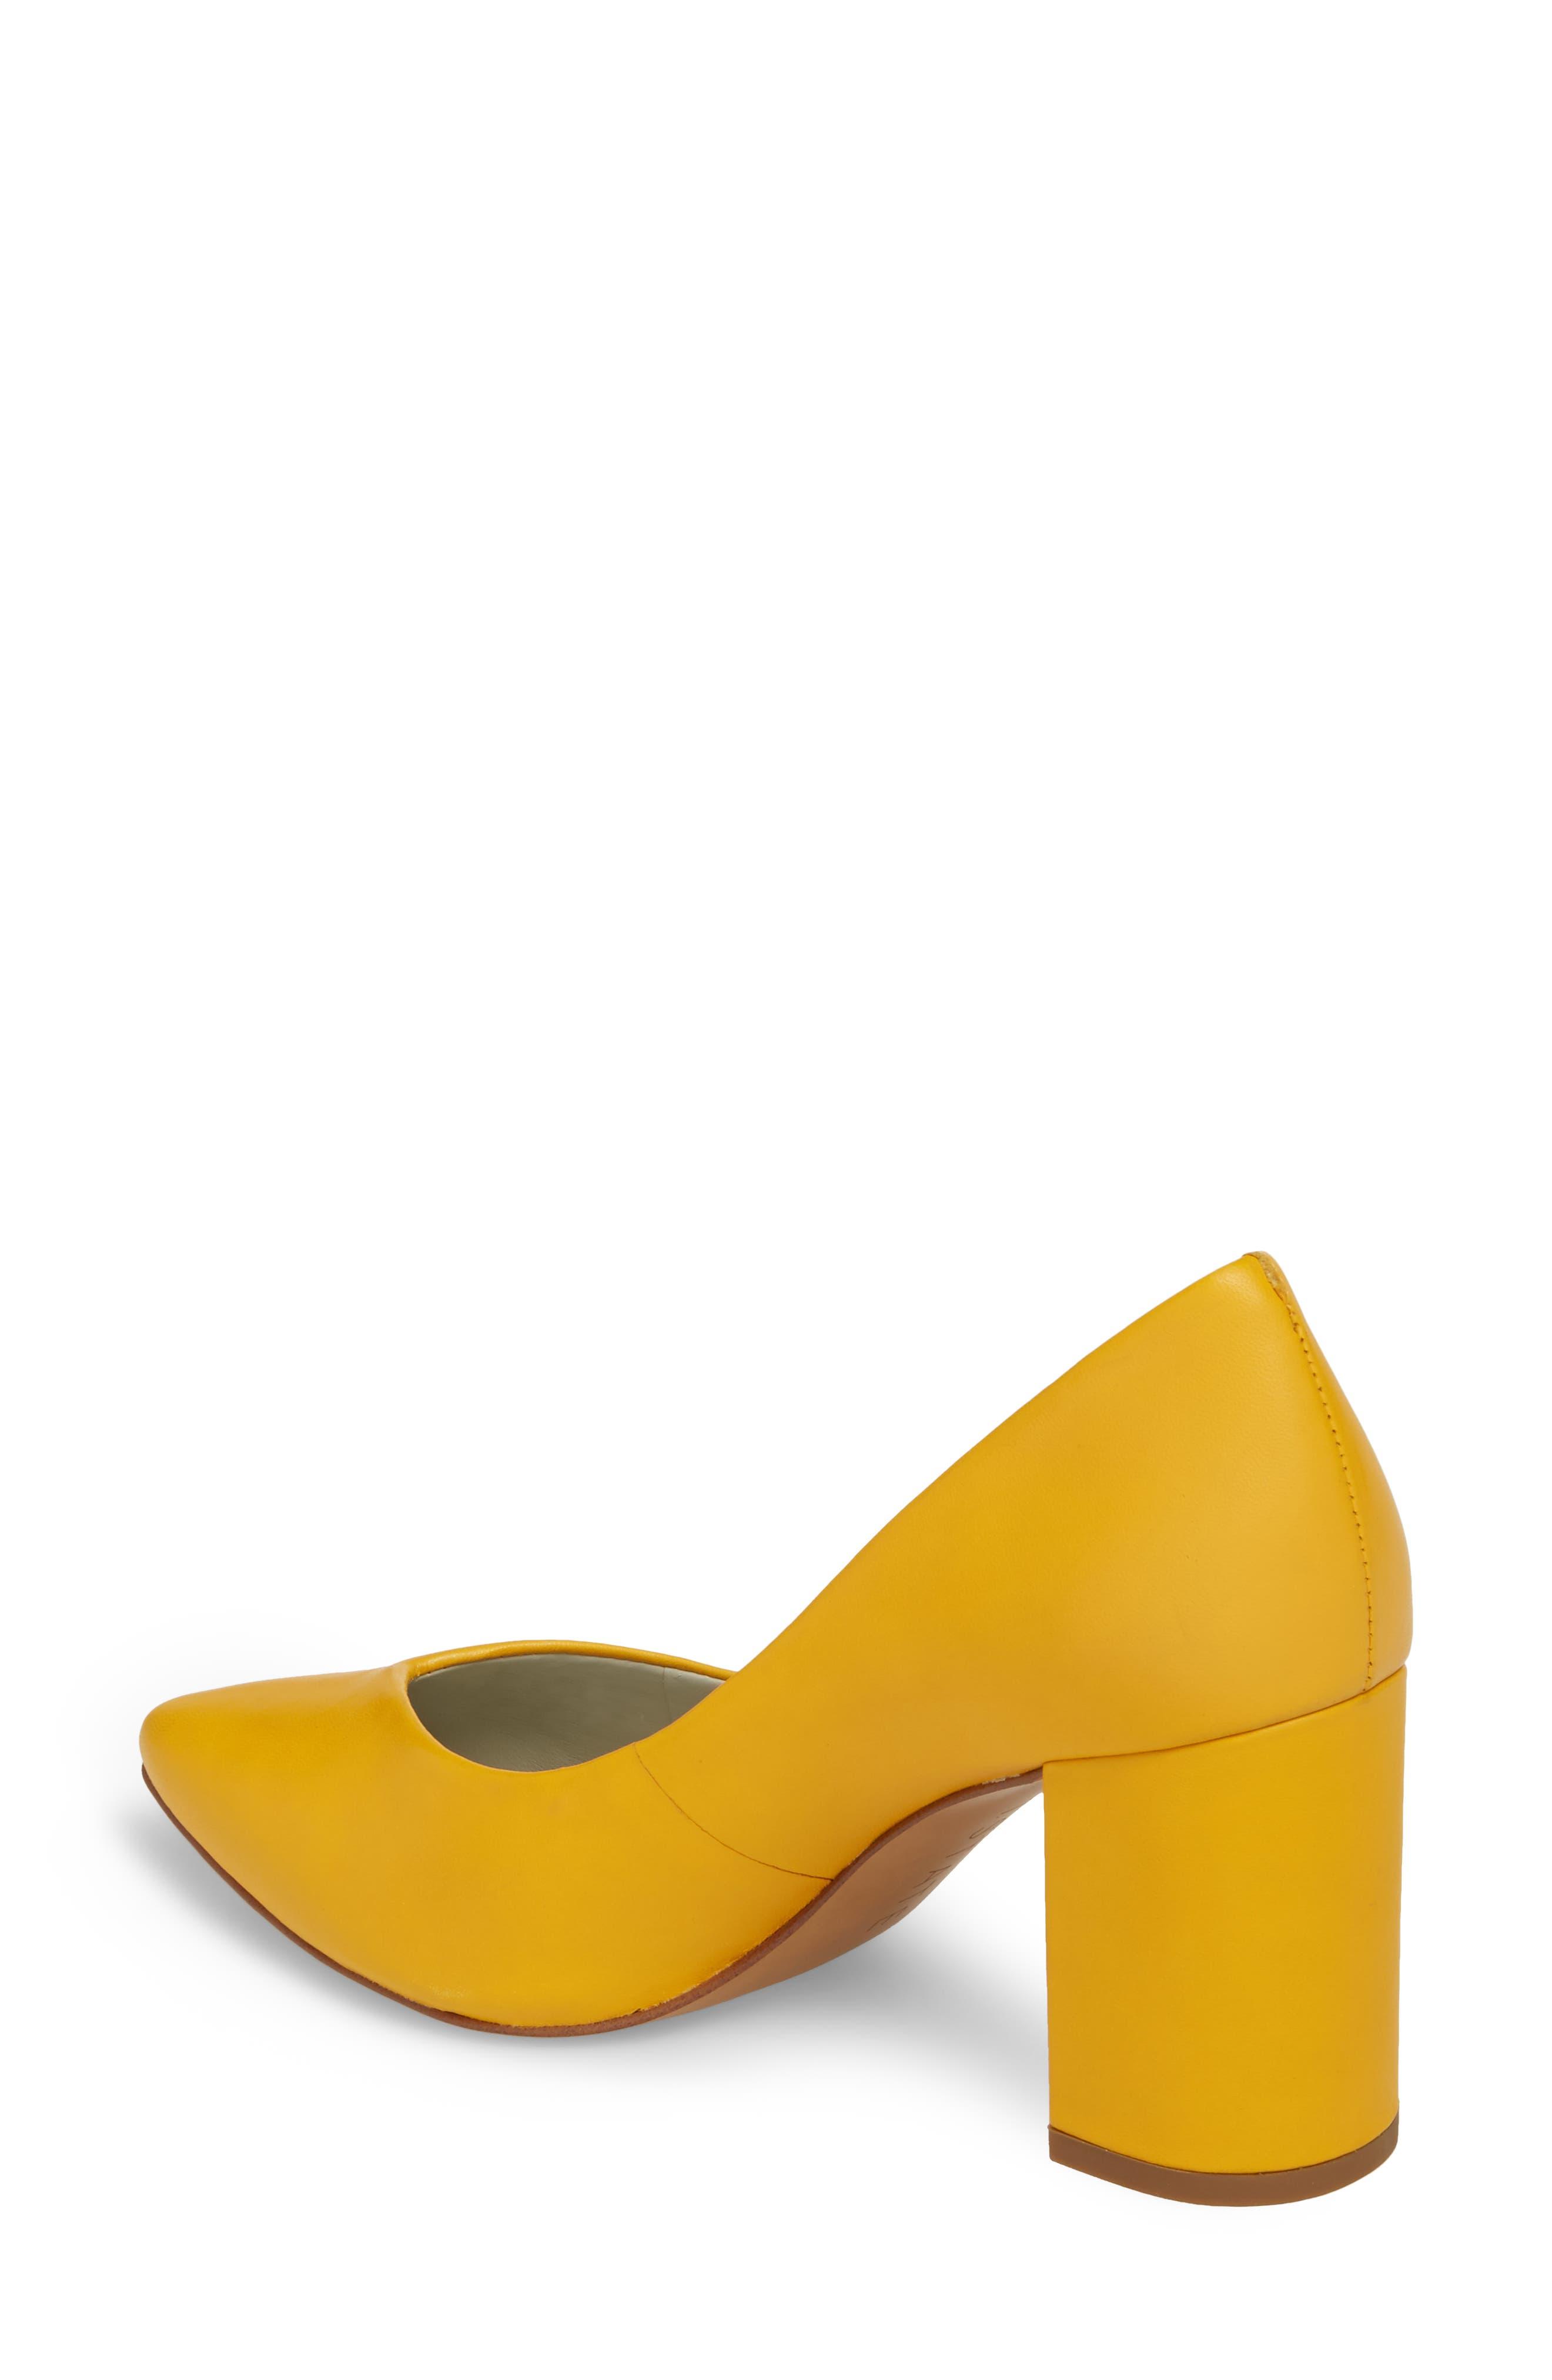 Saffy Block Heel Pump,                             Alternate thumbnail 2, color,                             Spectra Leather